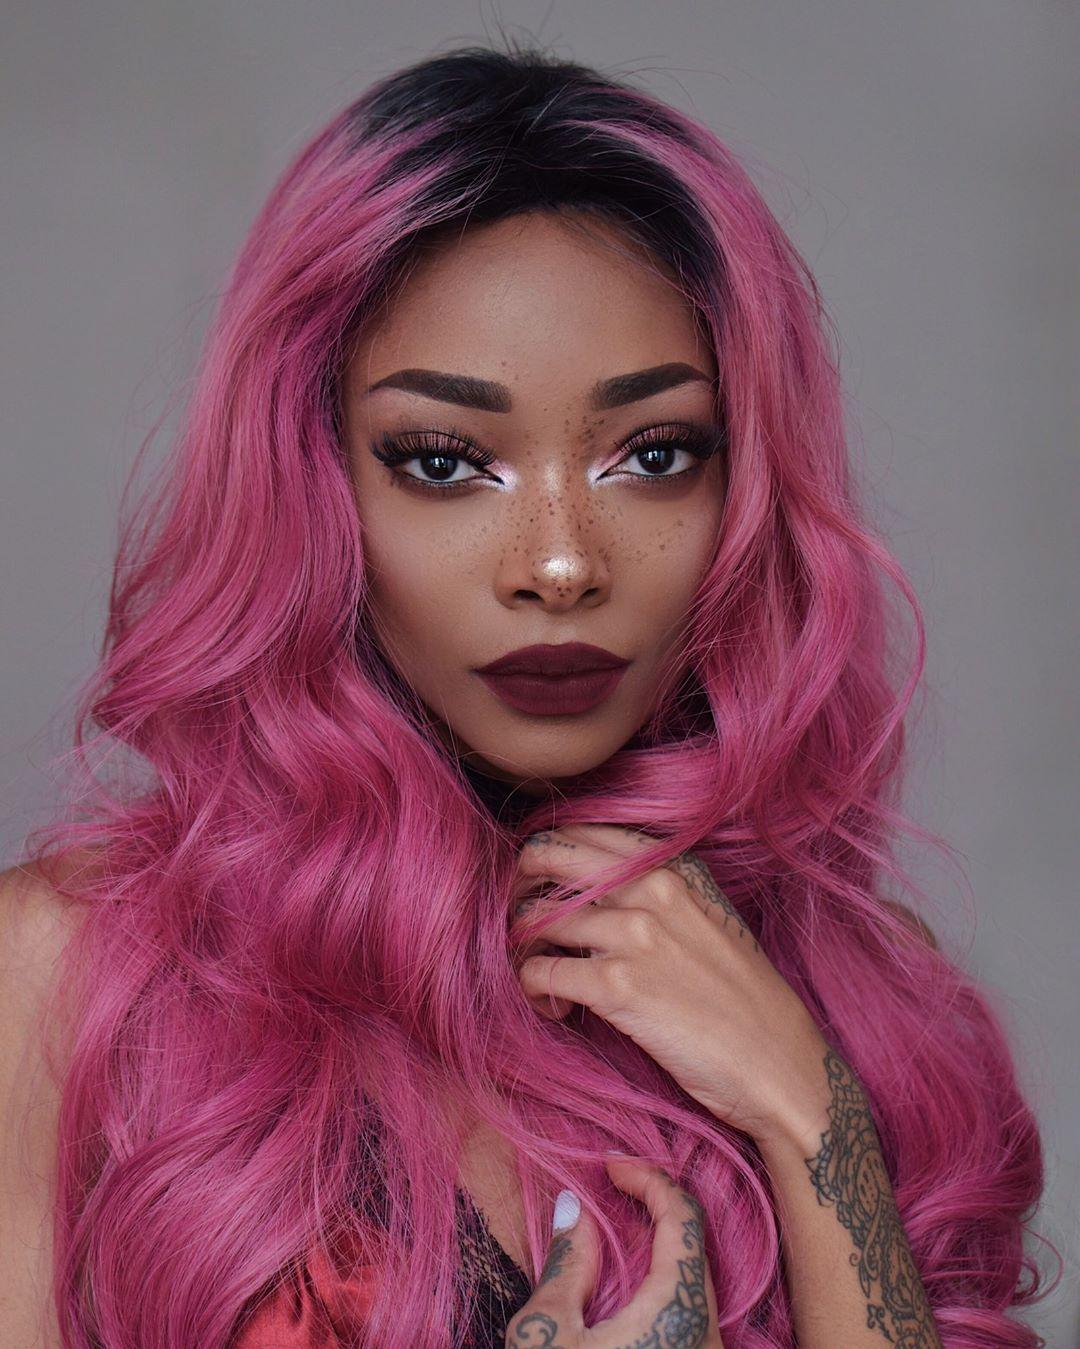 11 2k Likes 34 Comments Nyane Lebajoa Nyanelebajoa On Instagram Hair Colour Sext Chocolate Cherry By Limec Cherry Hair Hair Styles Pastel Pink Hair